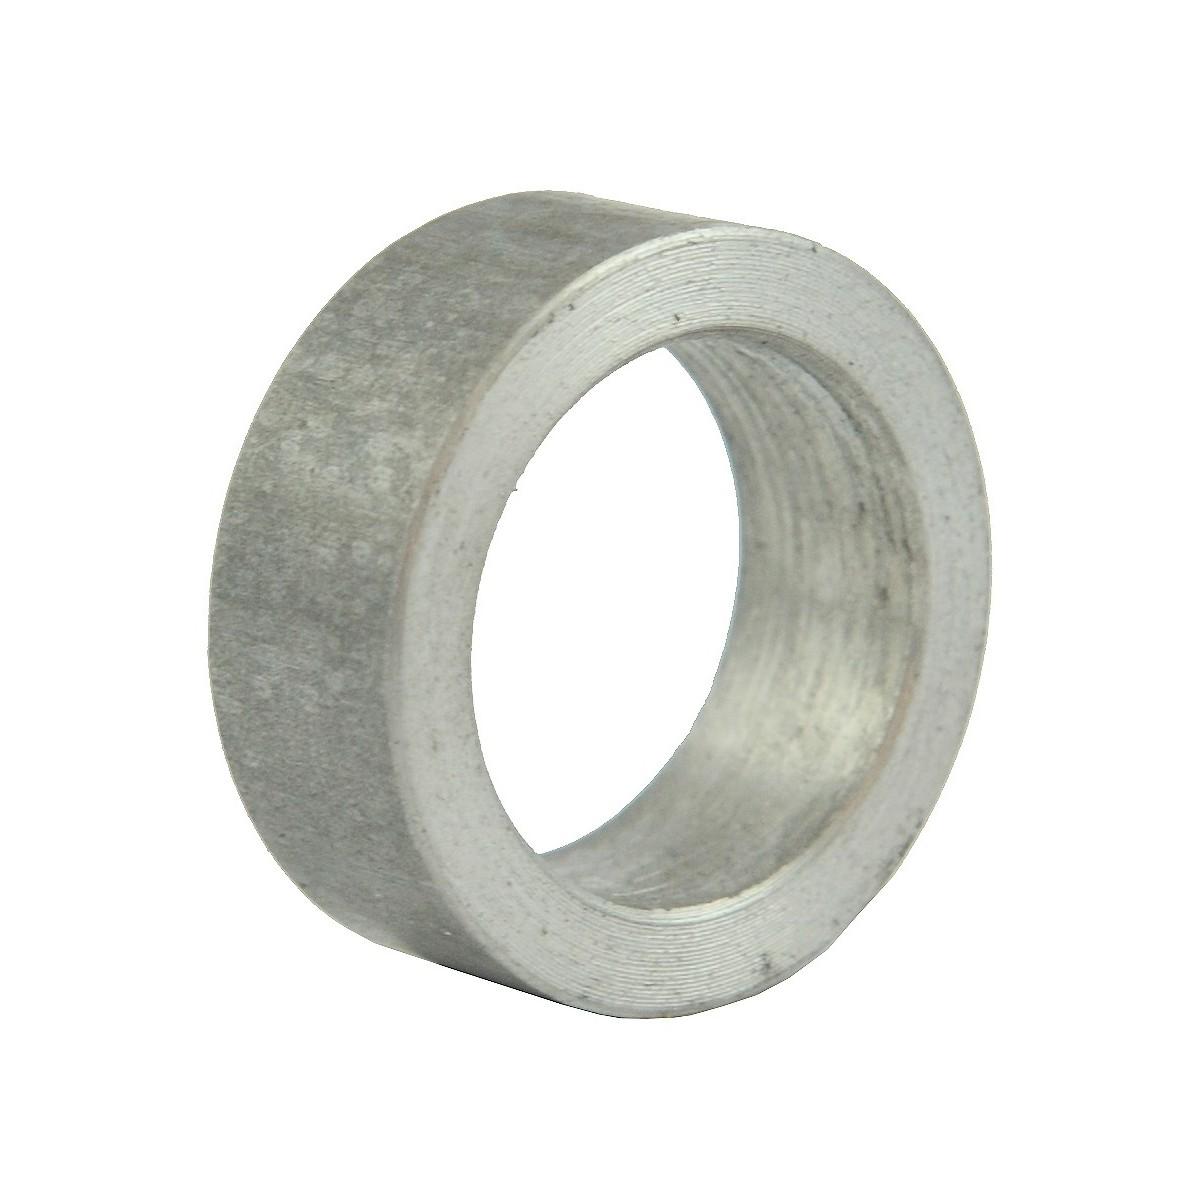 Sleeve bushing 25x35x13 mm ring